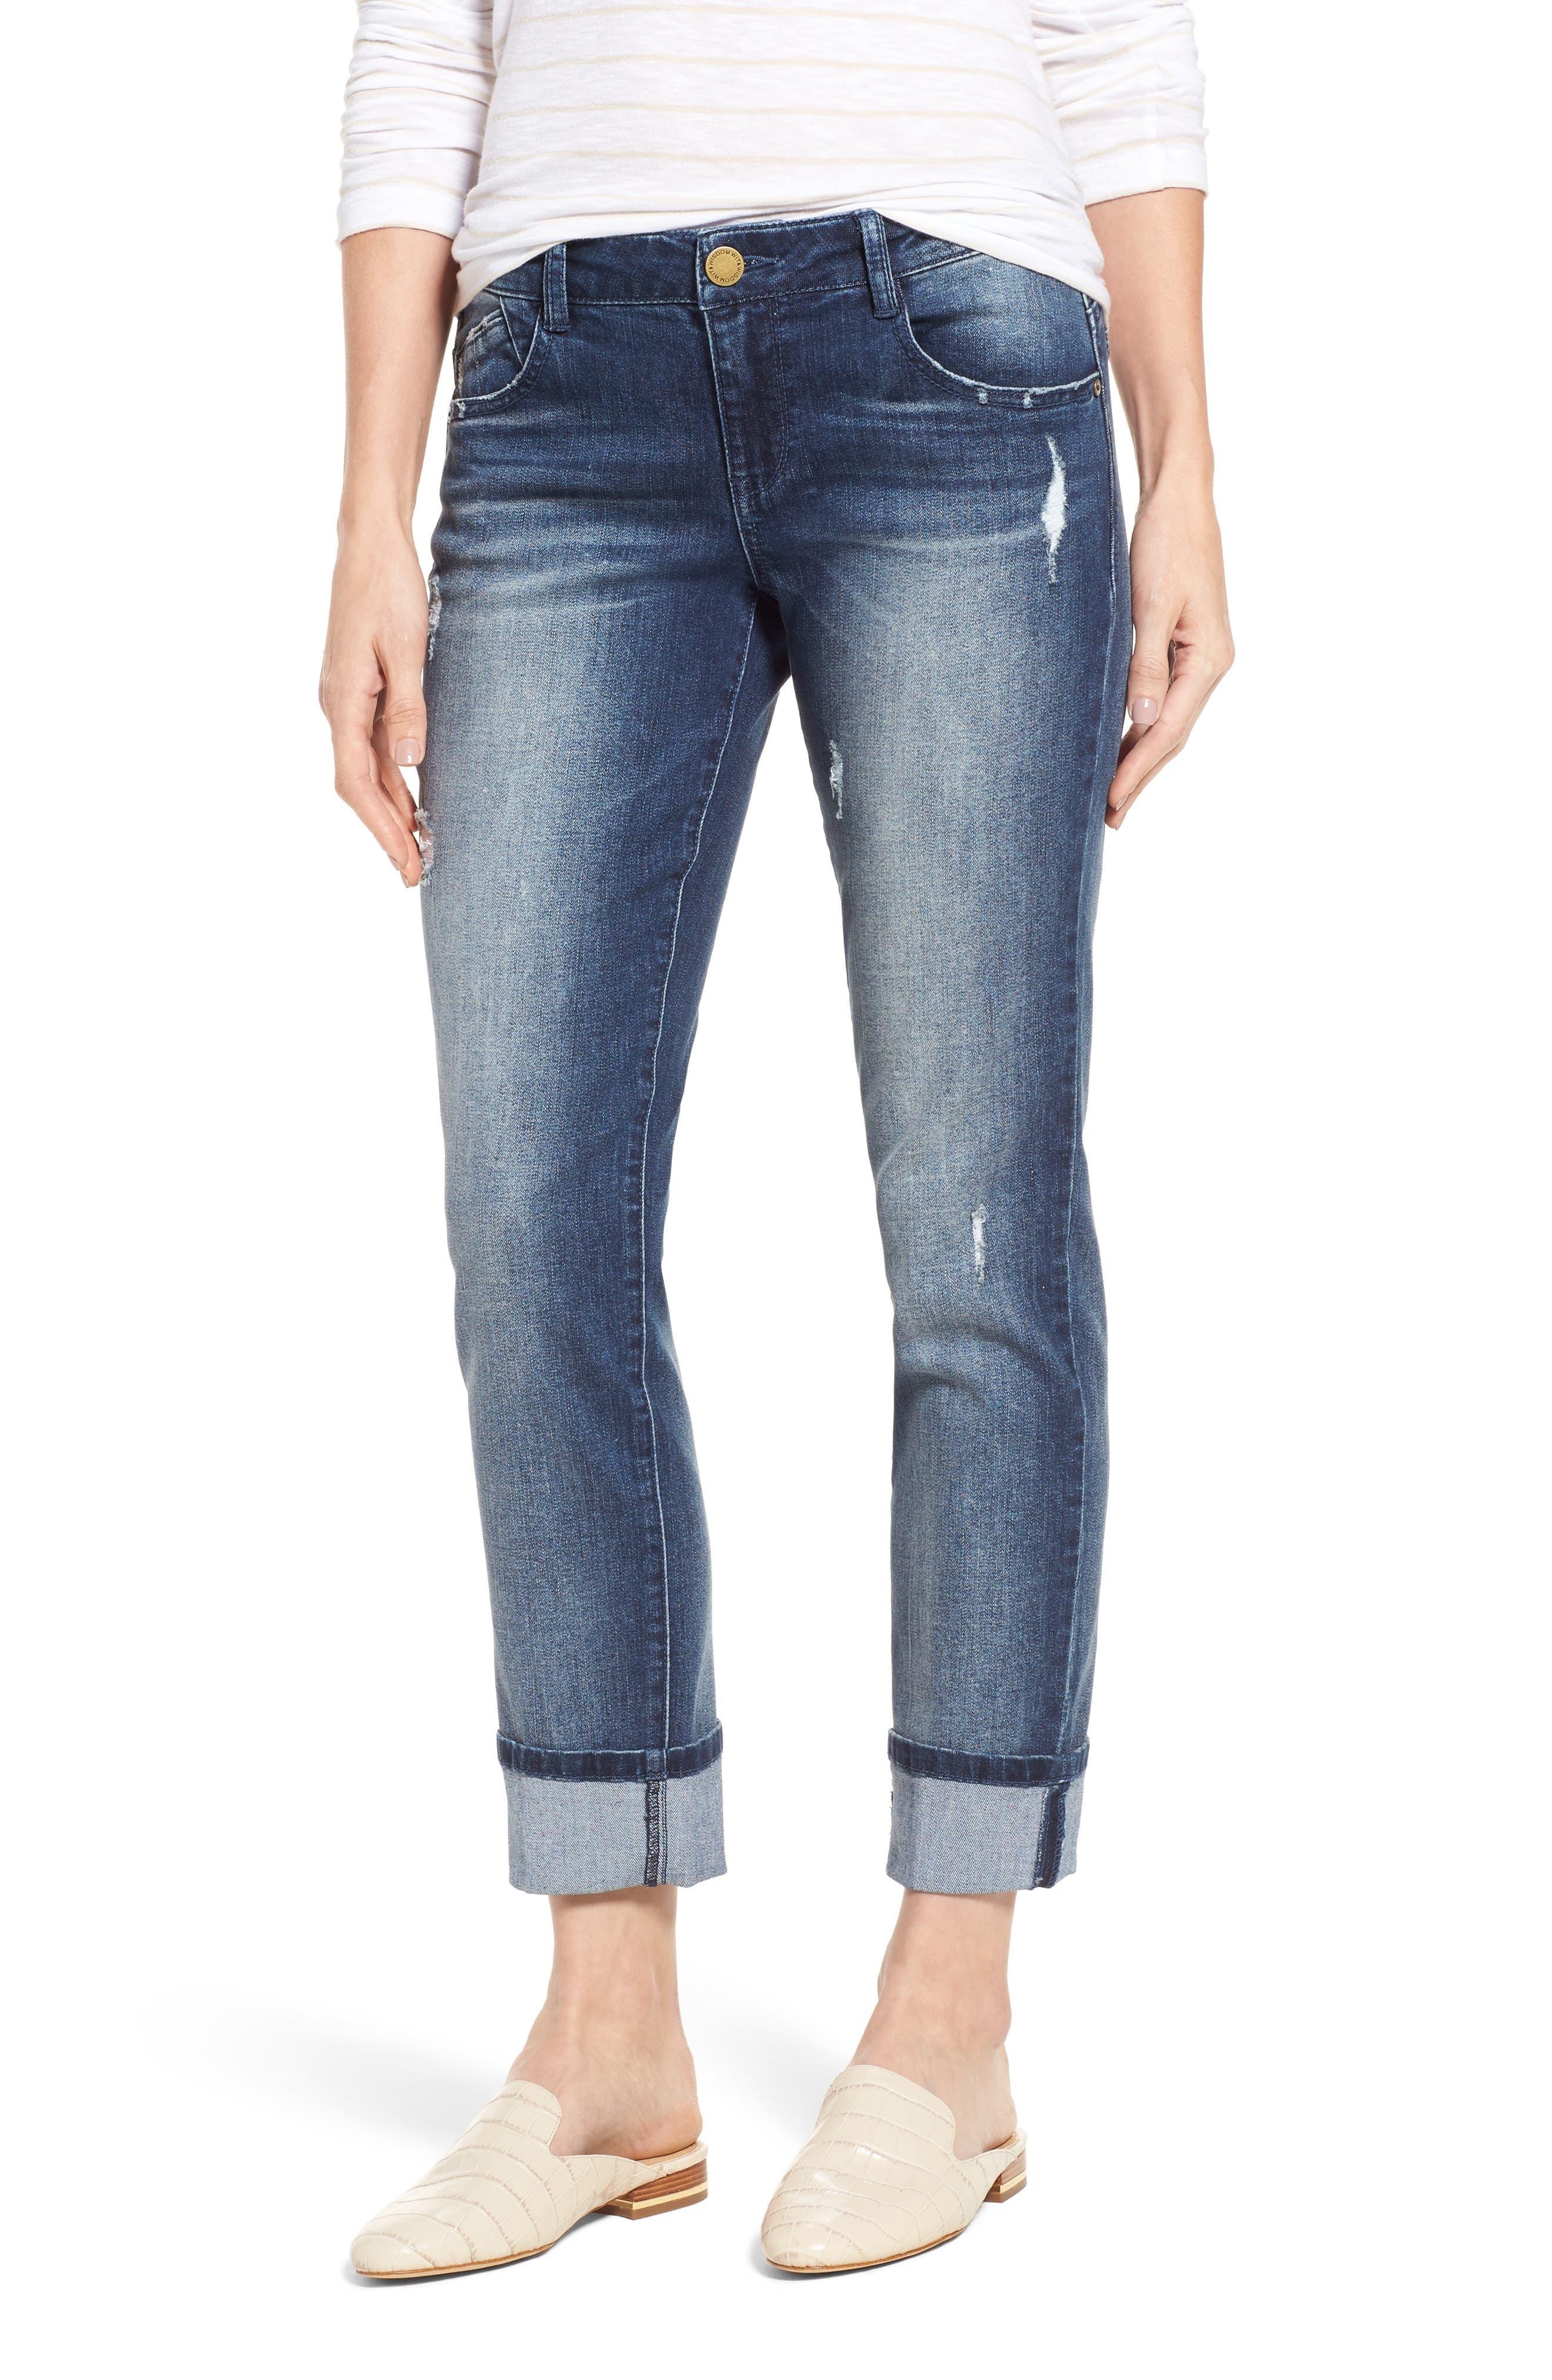 Main Image - Wit & Wisdom Flex-ellent Ripped Boyfriend Jeans (Regular & Petite) (Nordstrom Exclusive)